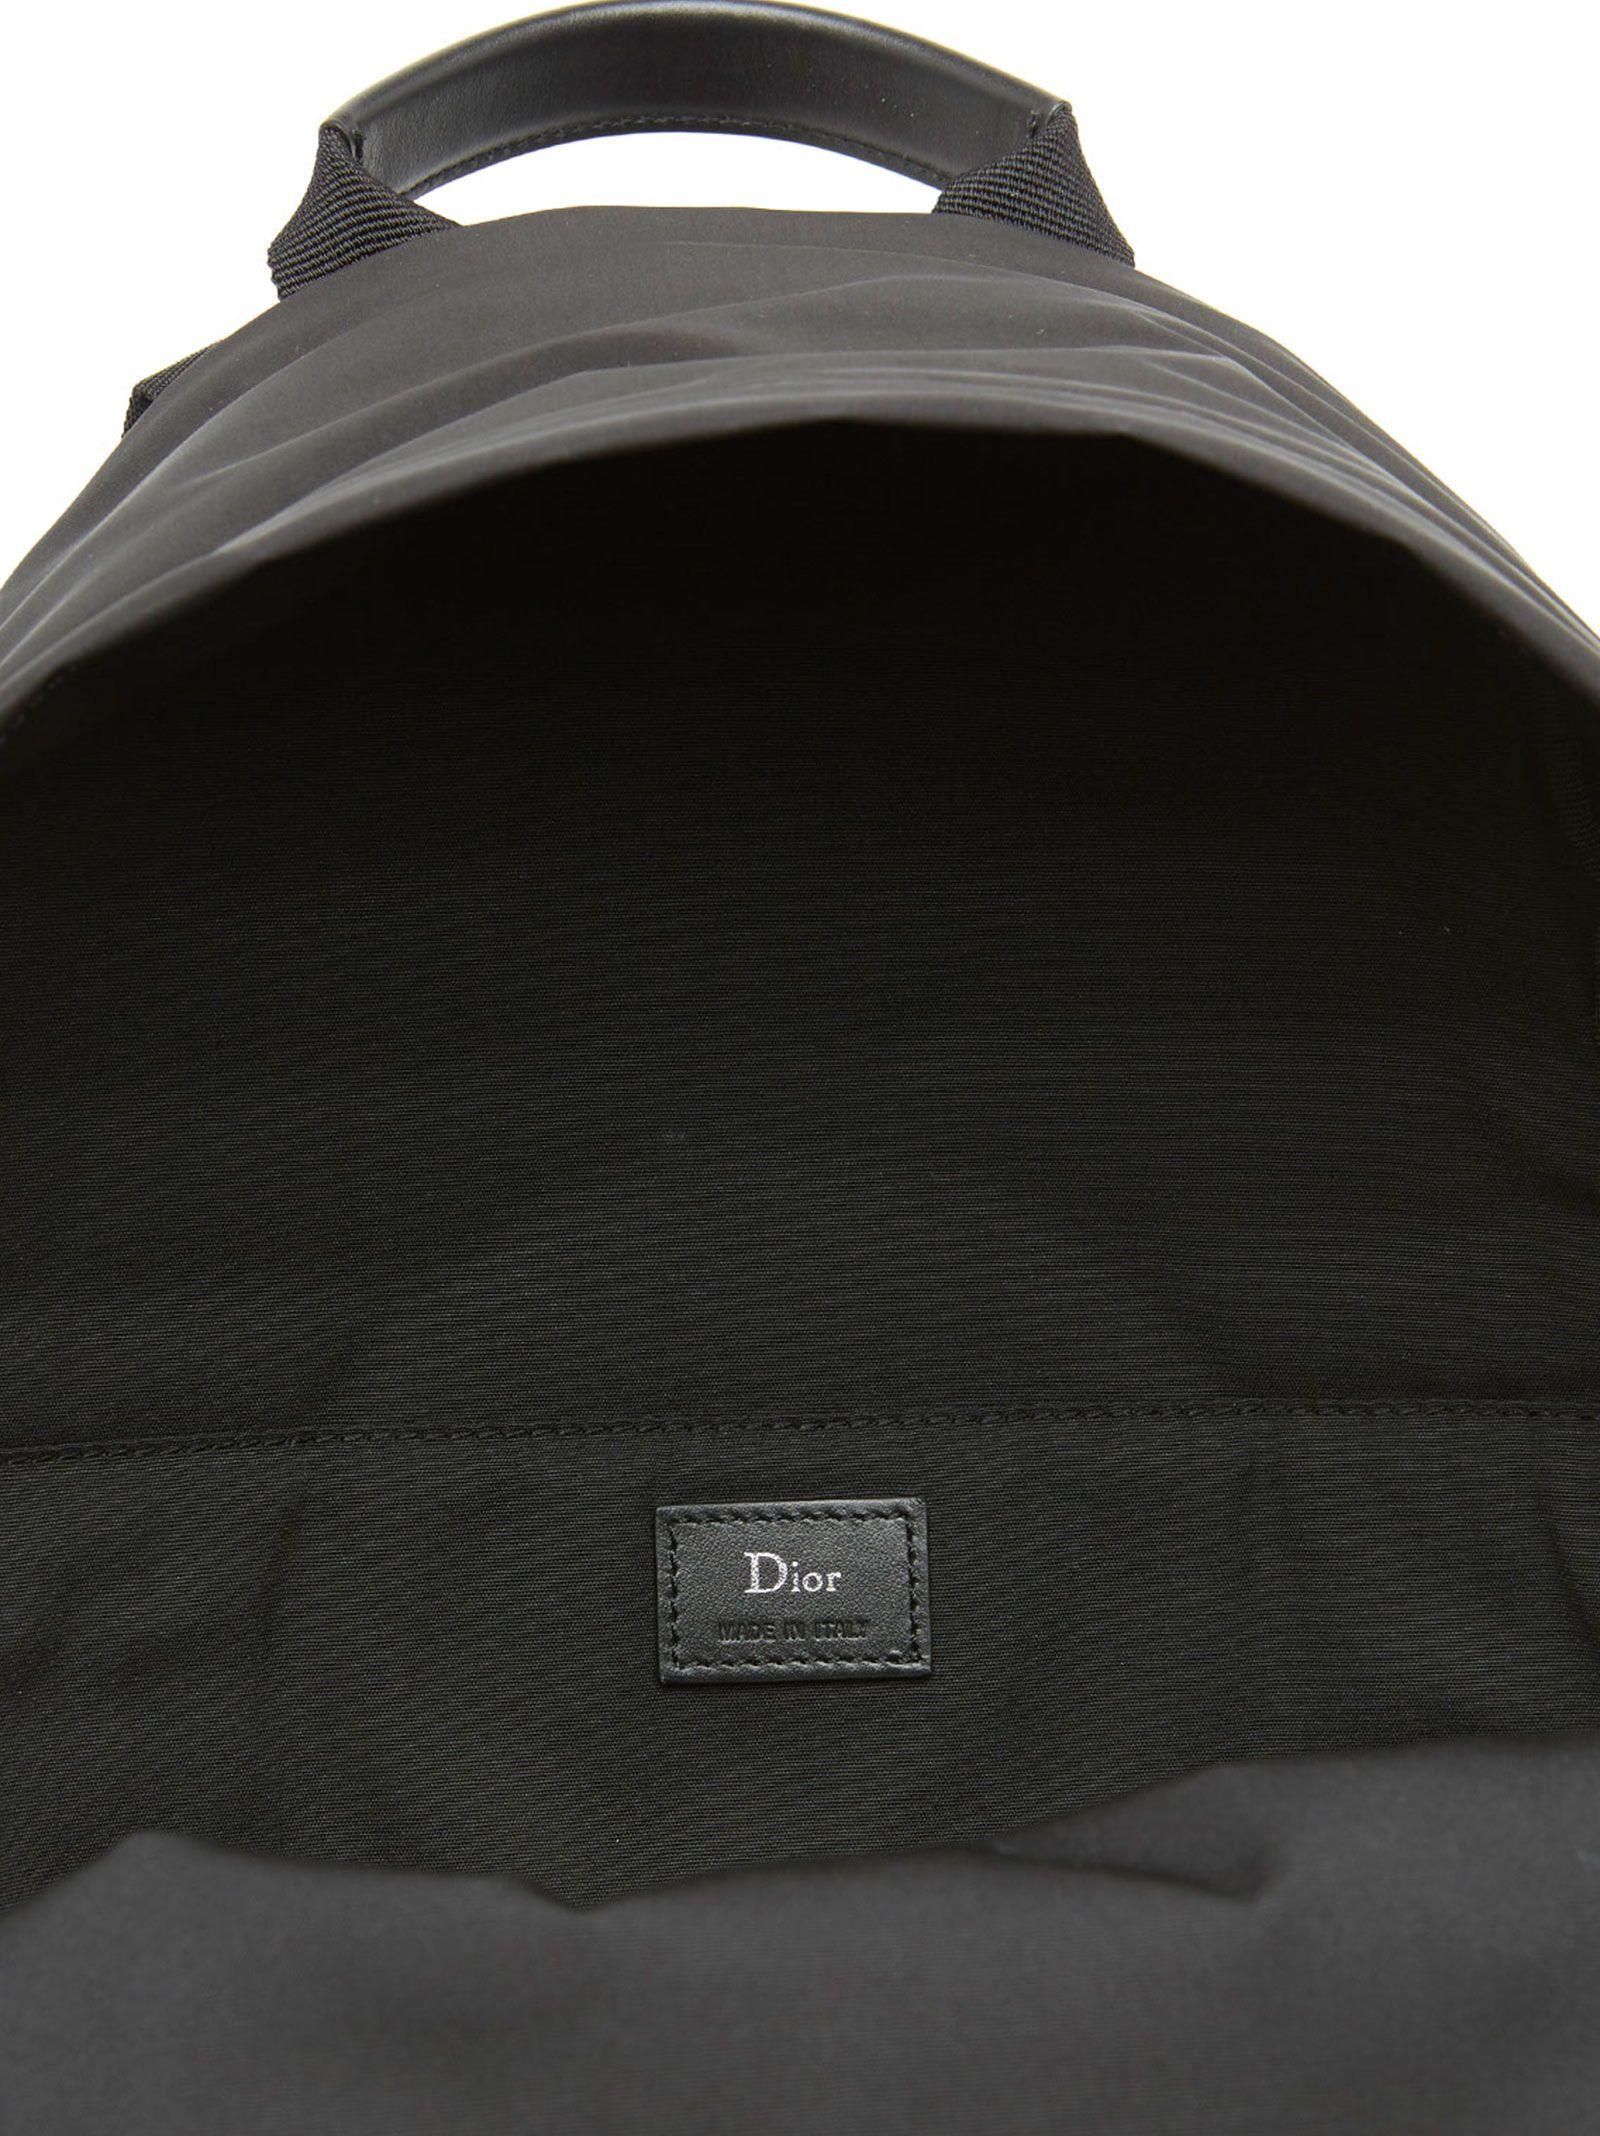 7346ff11bc43 Dior Dior Bag - Black - 10807197